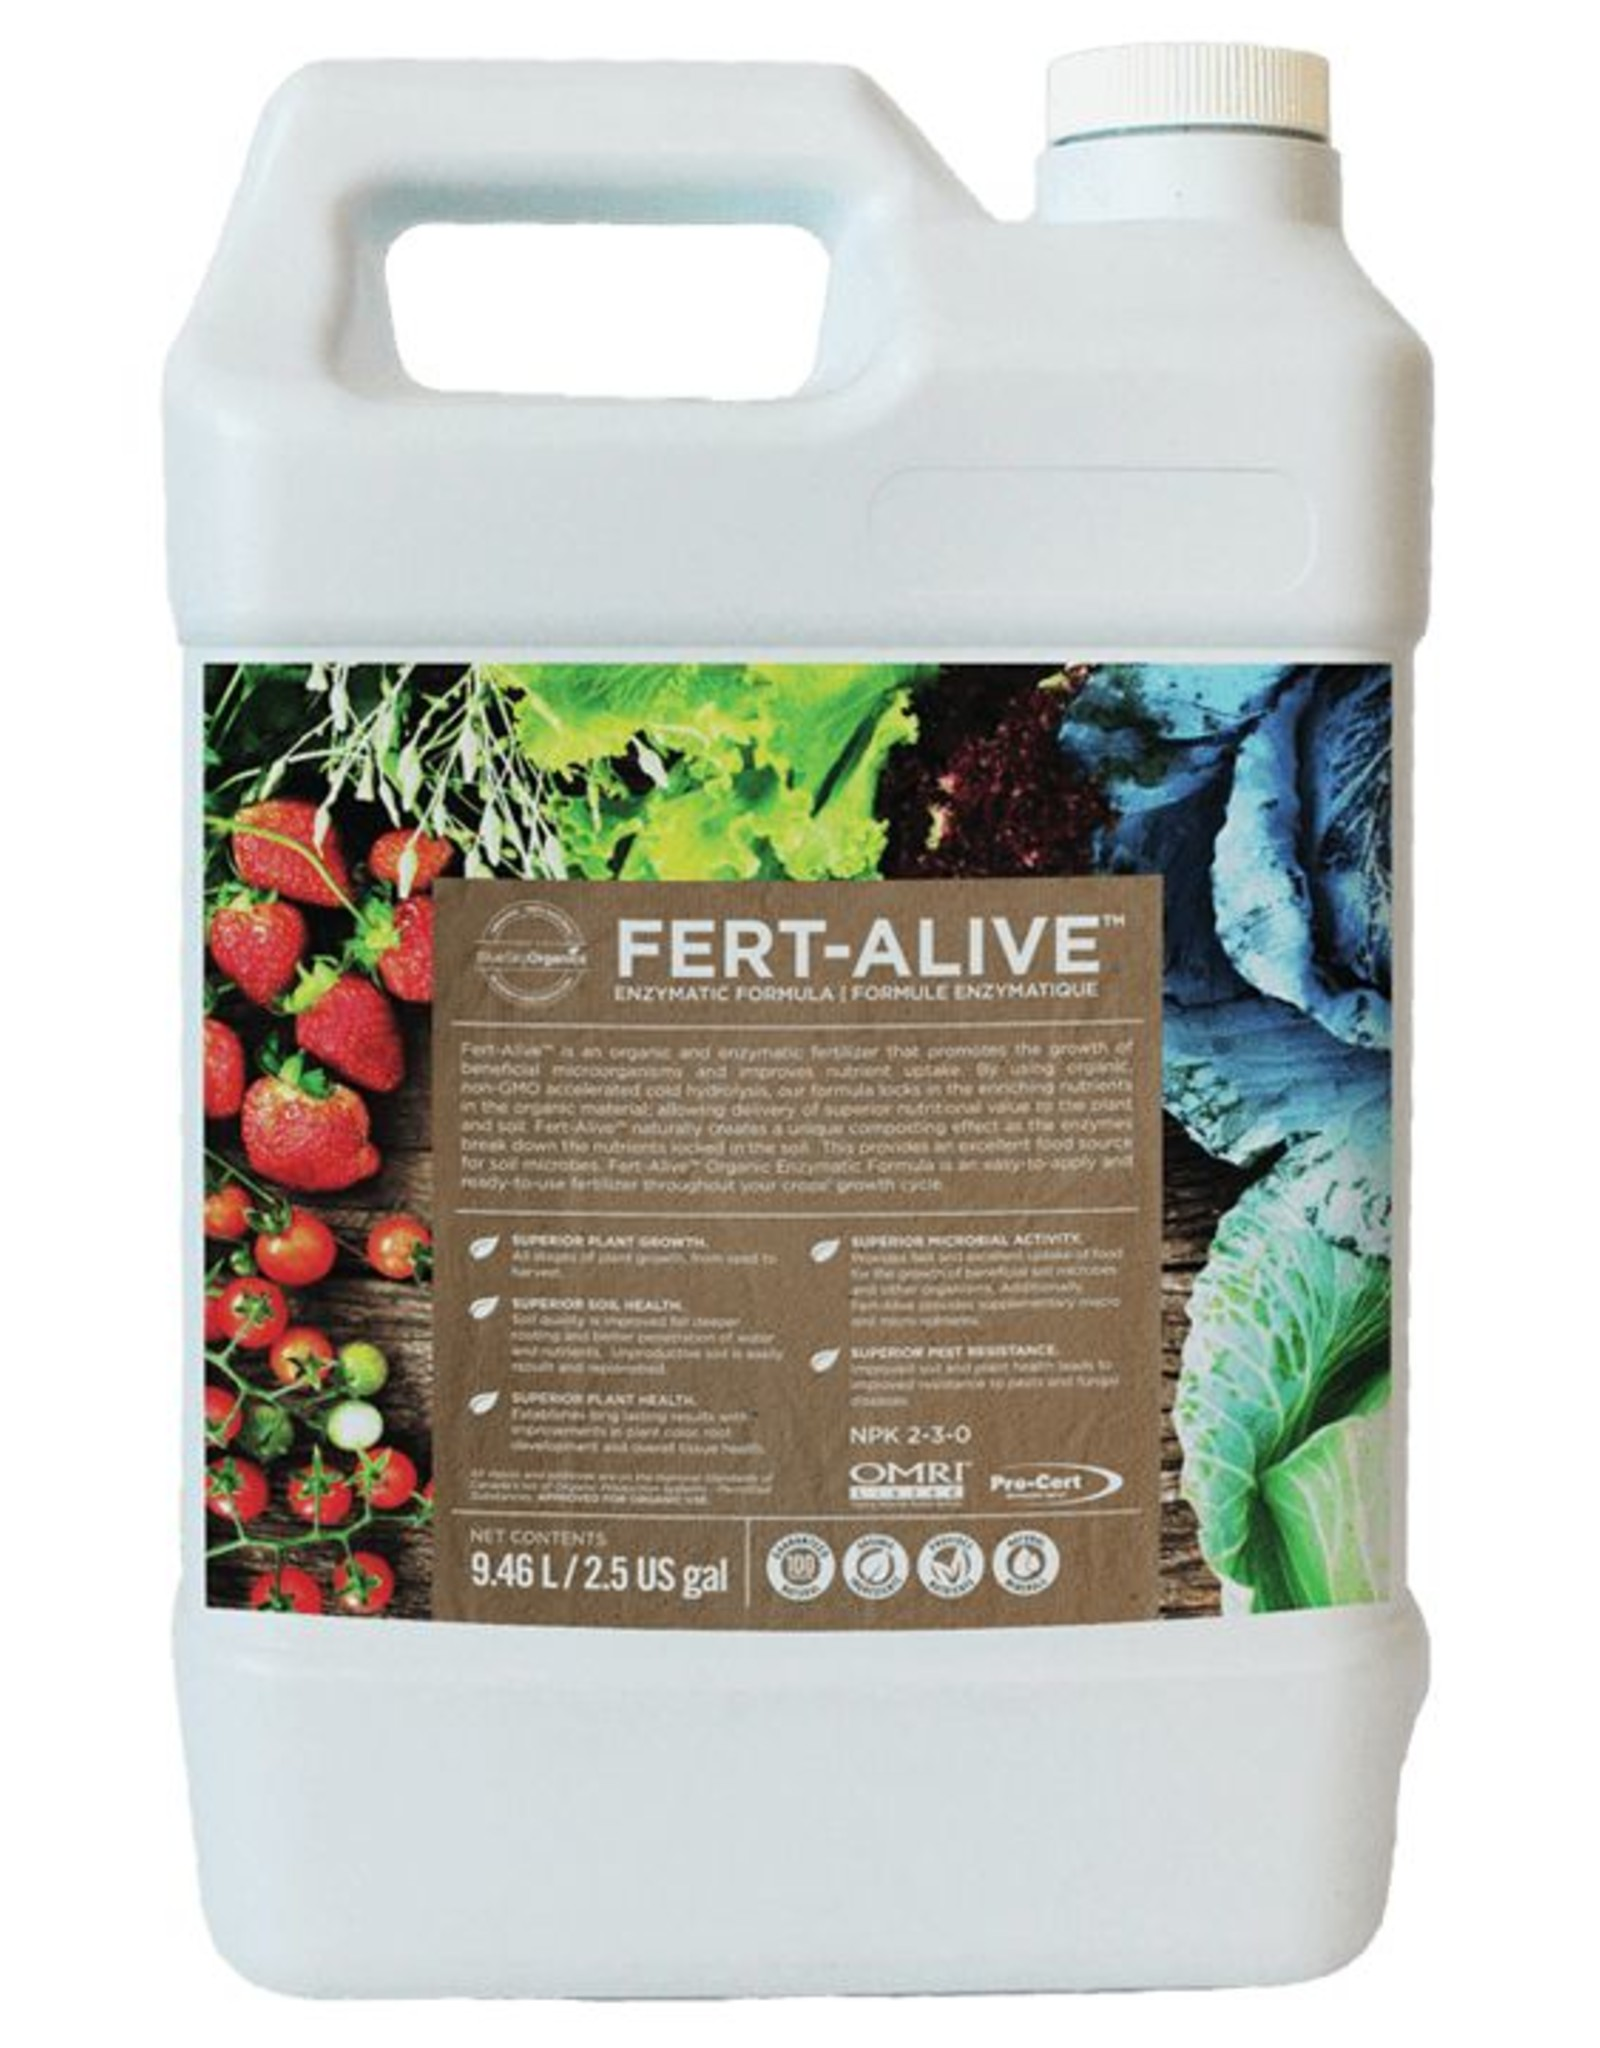 BlueSky Organics Fert-Alive 2.5gal